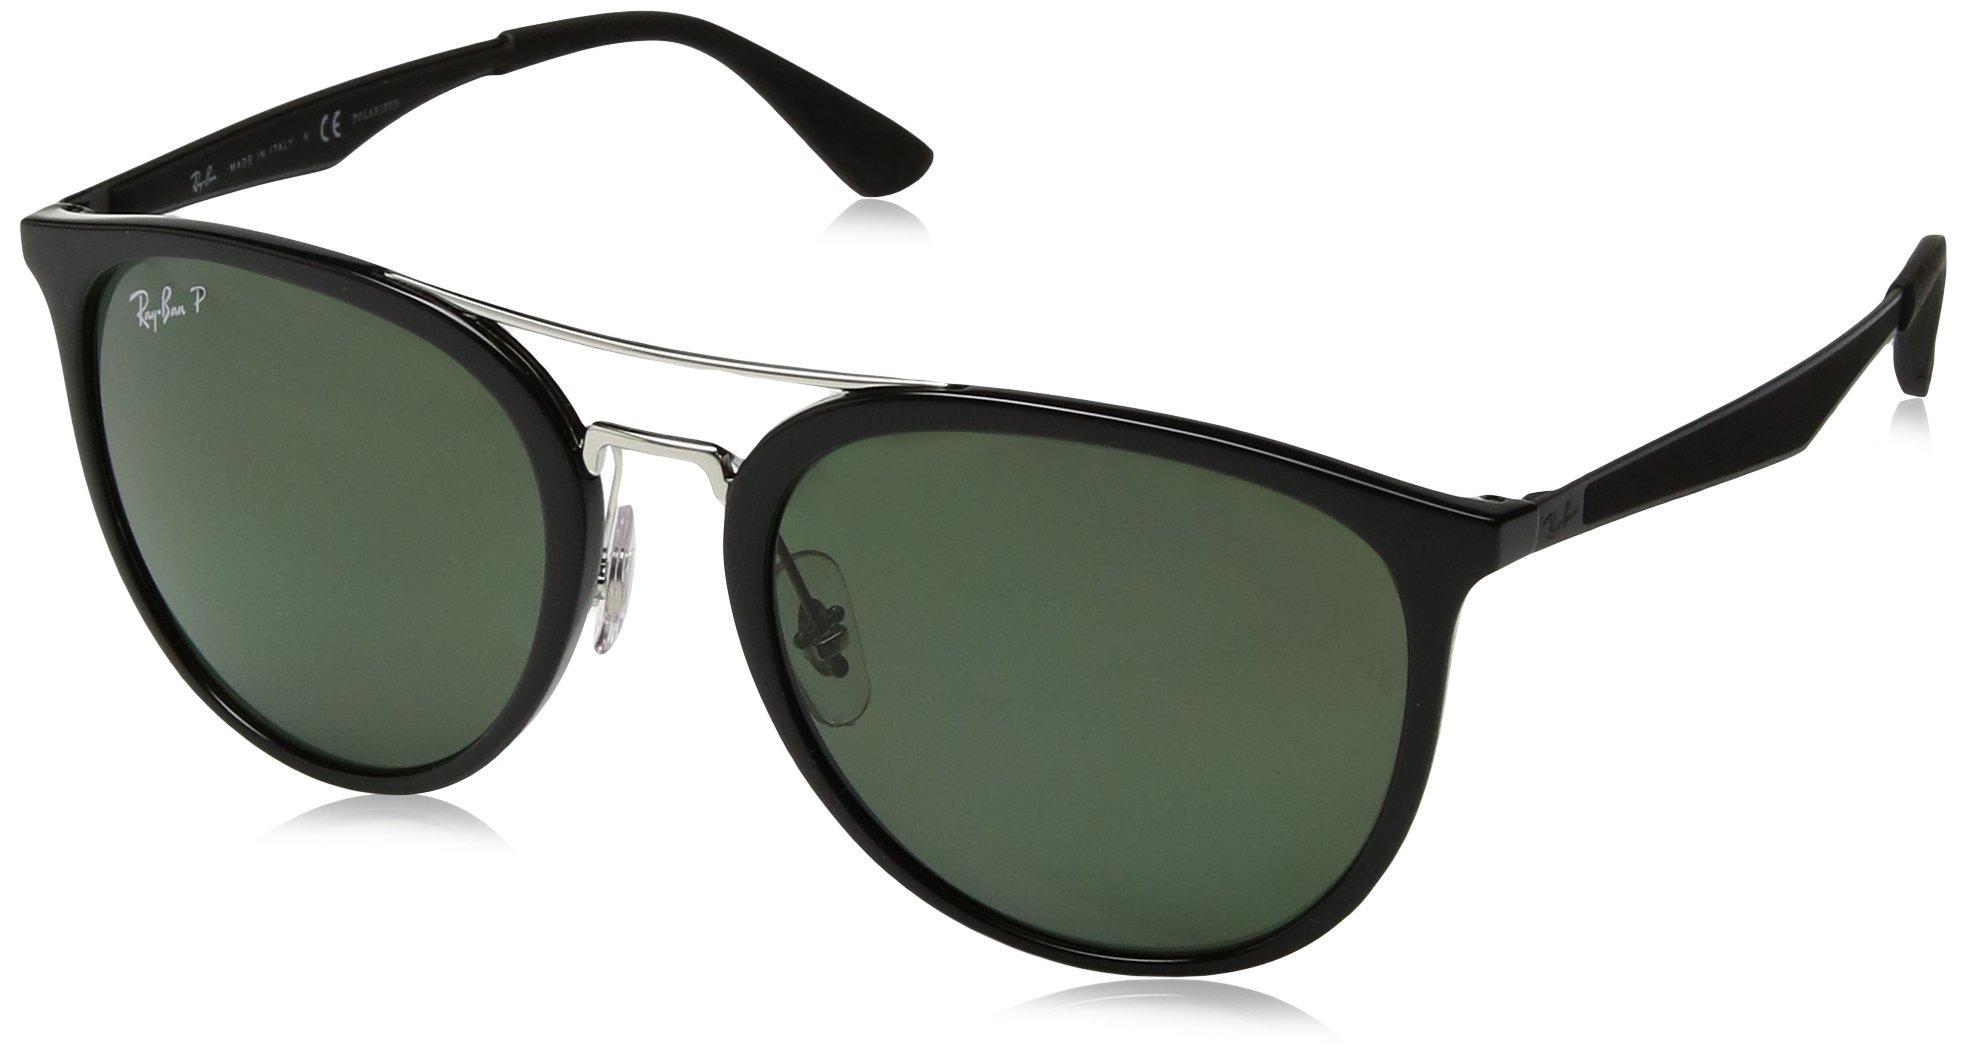 Ray-Ban Men's Plastic Man Square Sunglasses, Translucent Blue, 55 mm